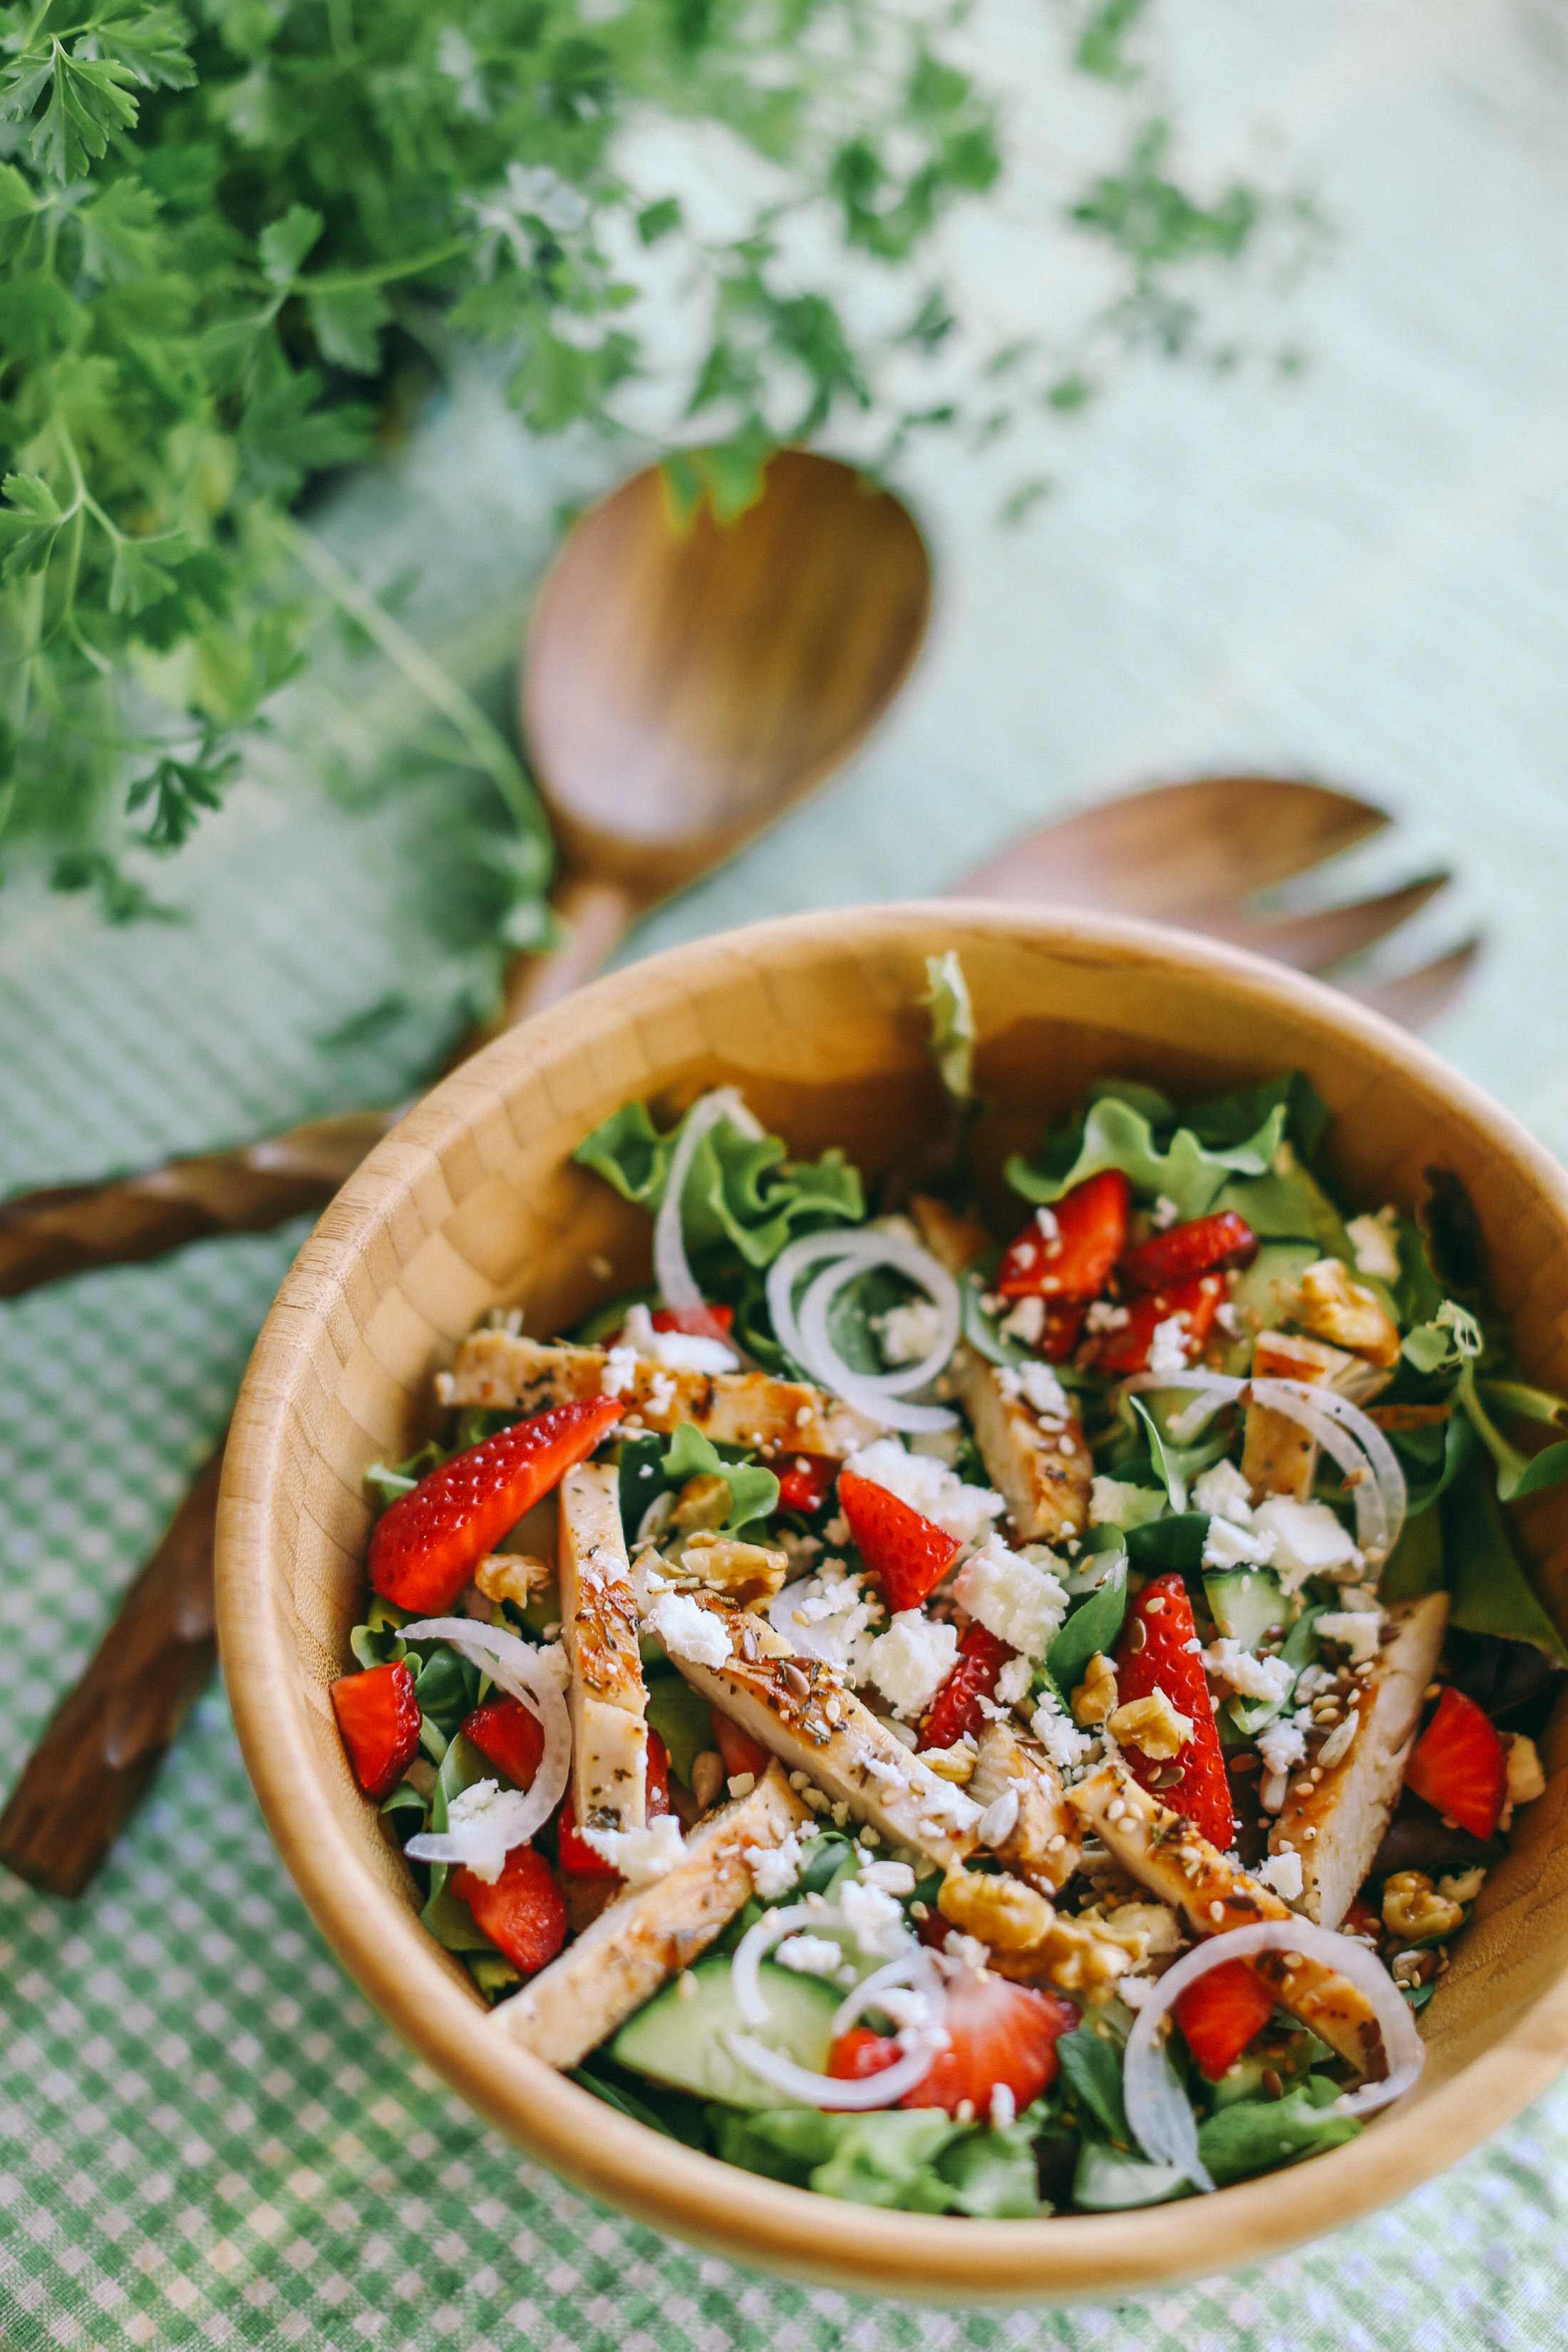 strawberry-mint-salad-recipe-summer